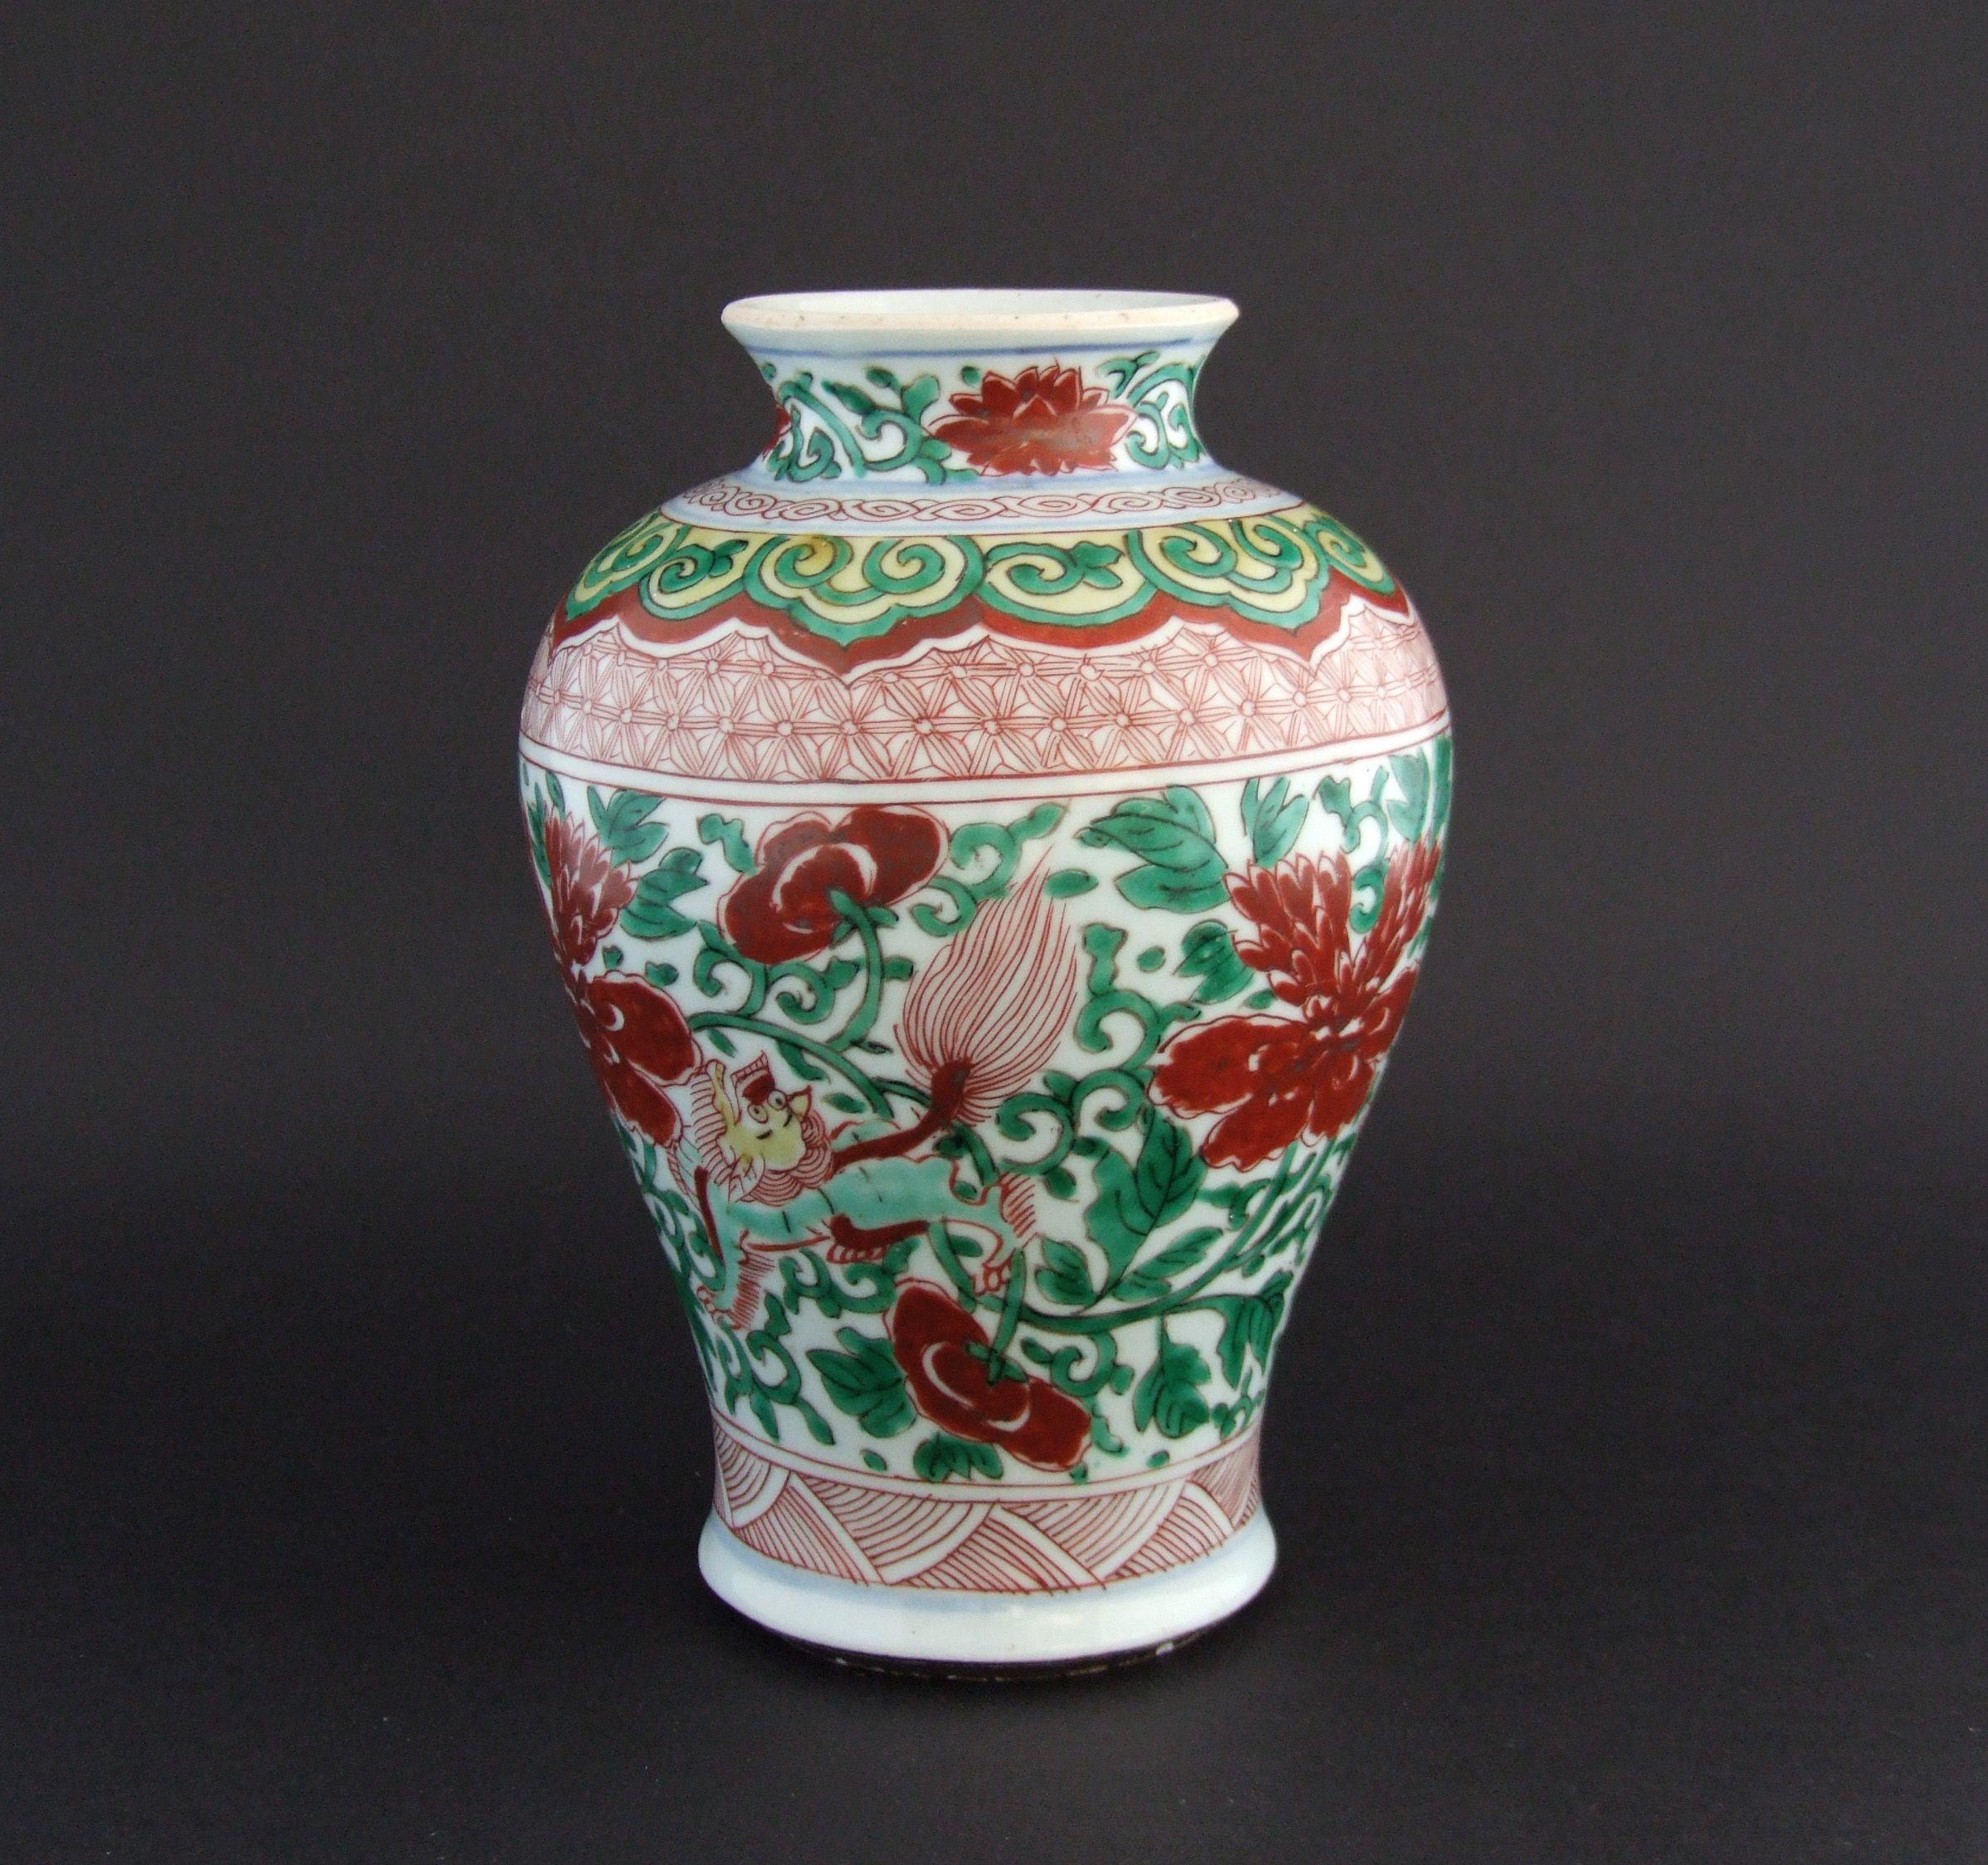 A Transitional Wucai Porcelain Vase, Early Qing Dynasty, Shunzhi